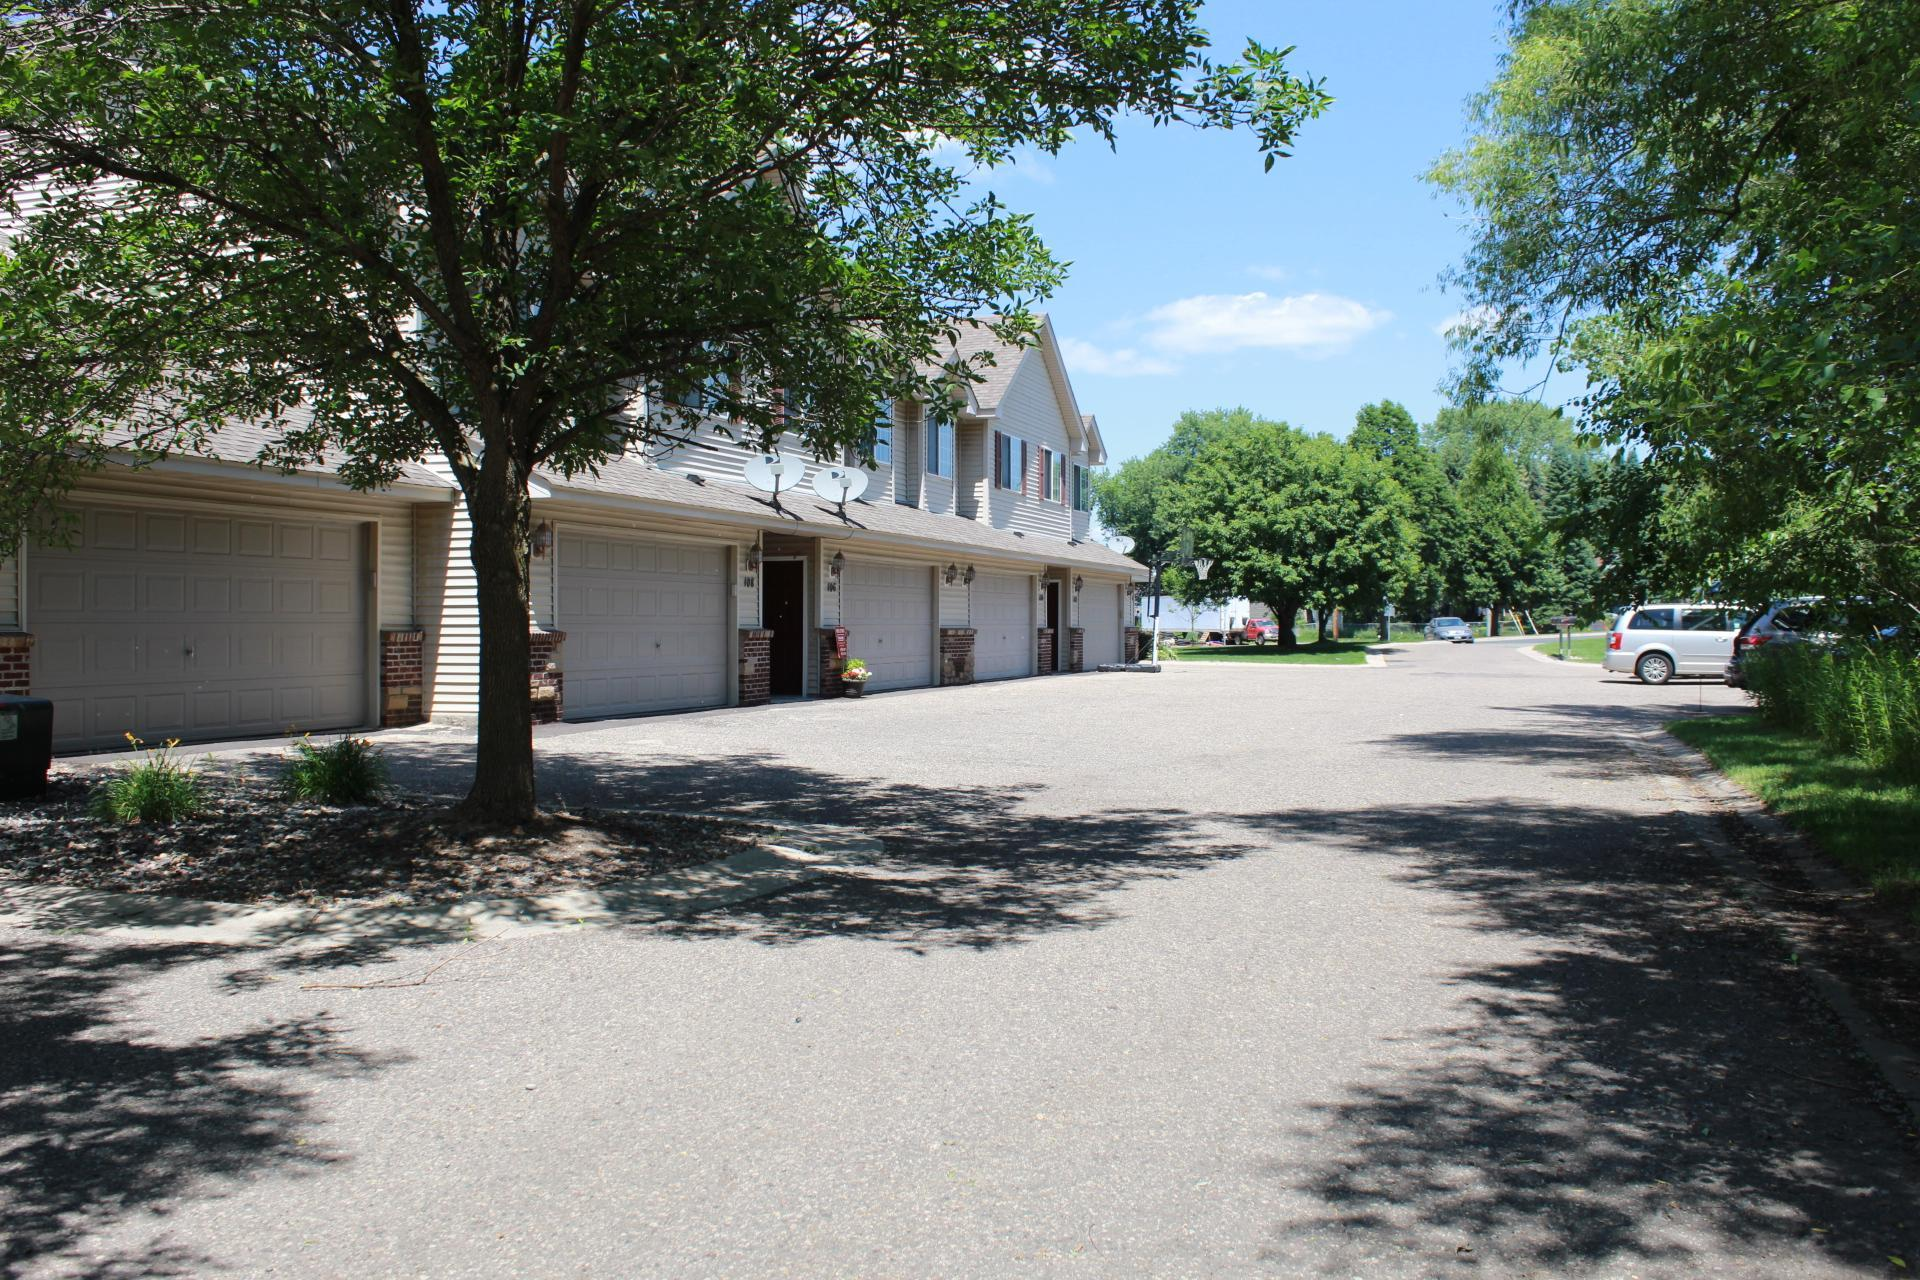 106 Firebarn Property Photo - Circle Pines, MN real estate listing